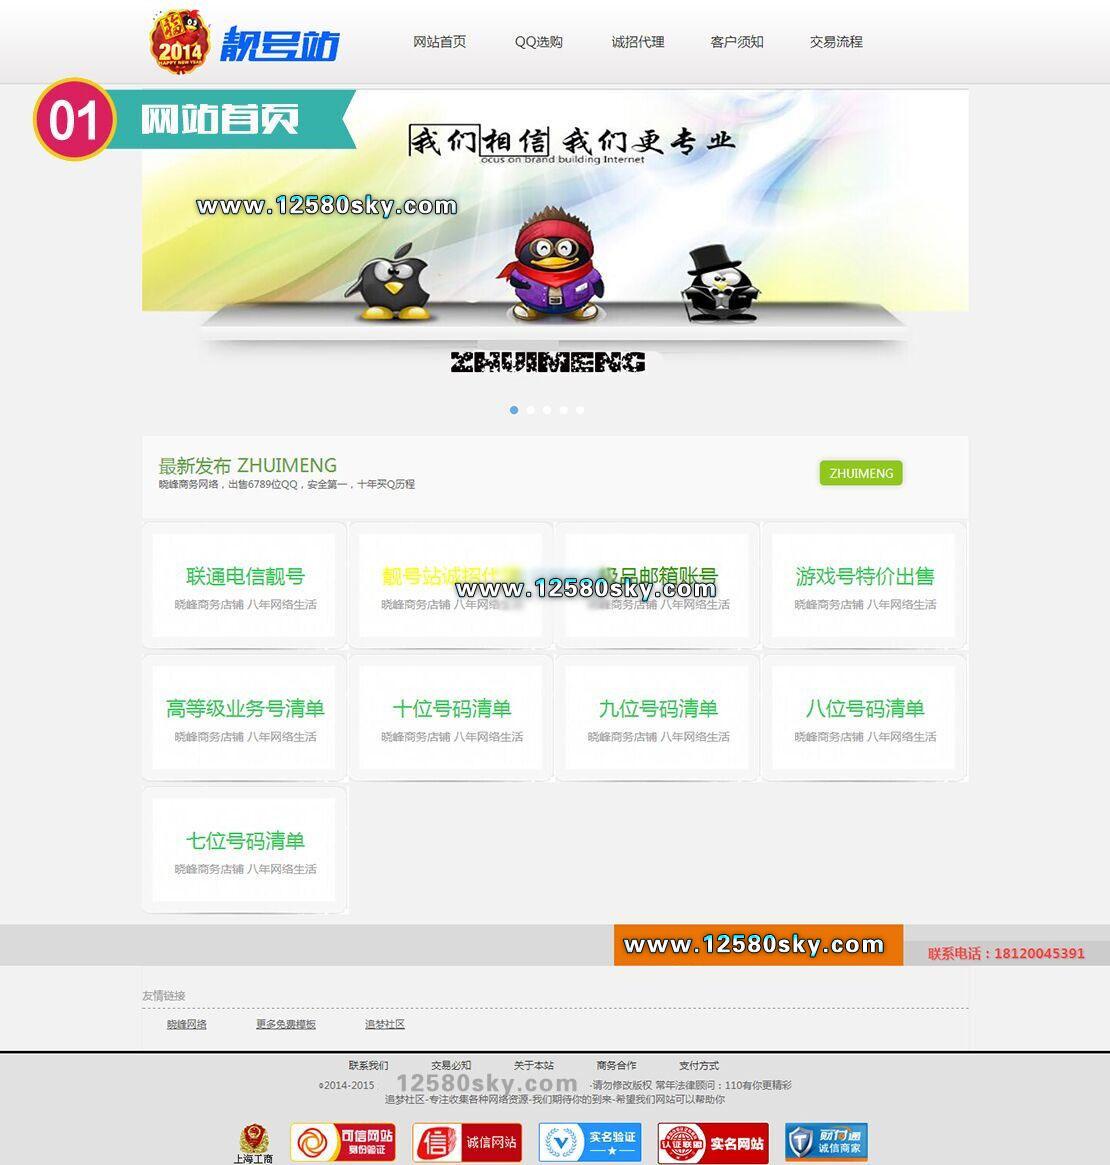 QQ卖号、选号网站源码 【站长聚集地首发】织梦CMS系统